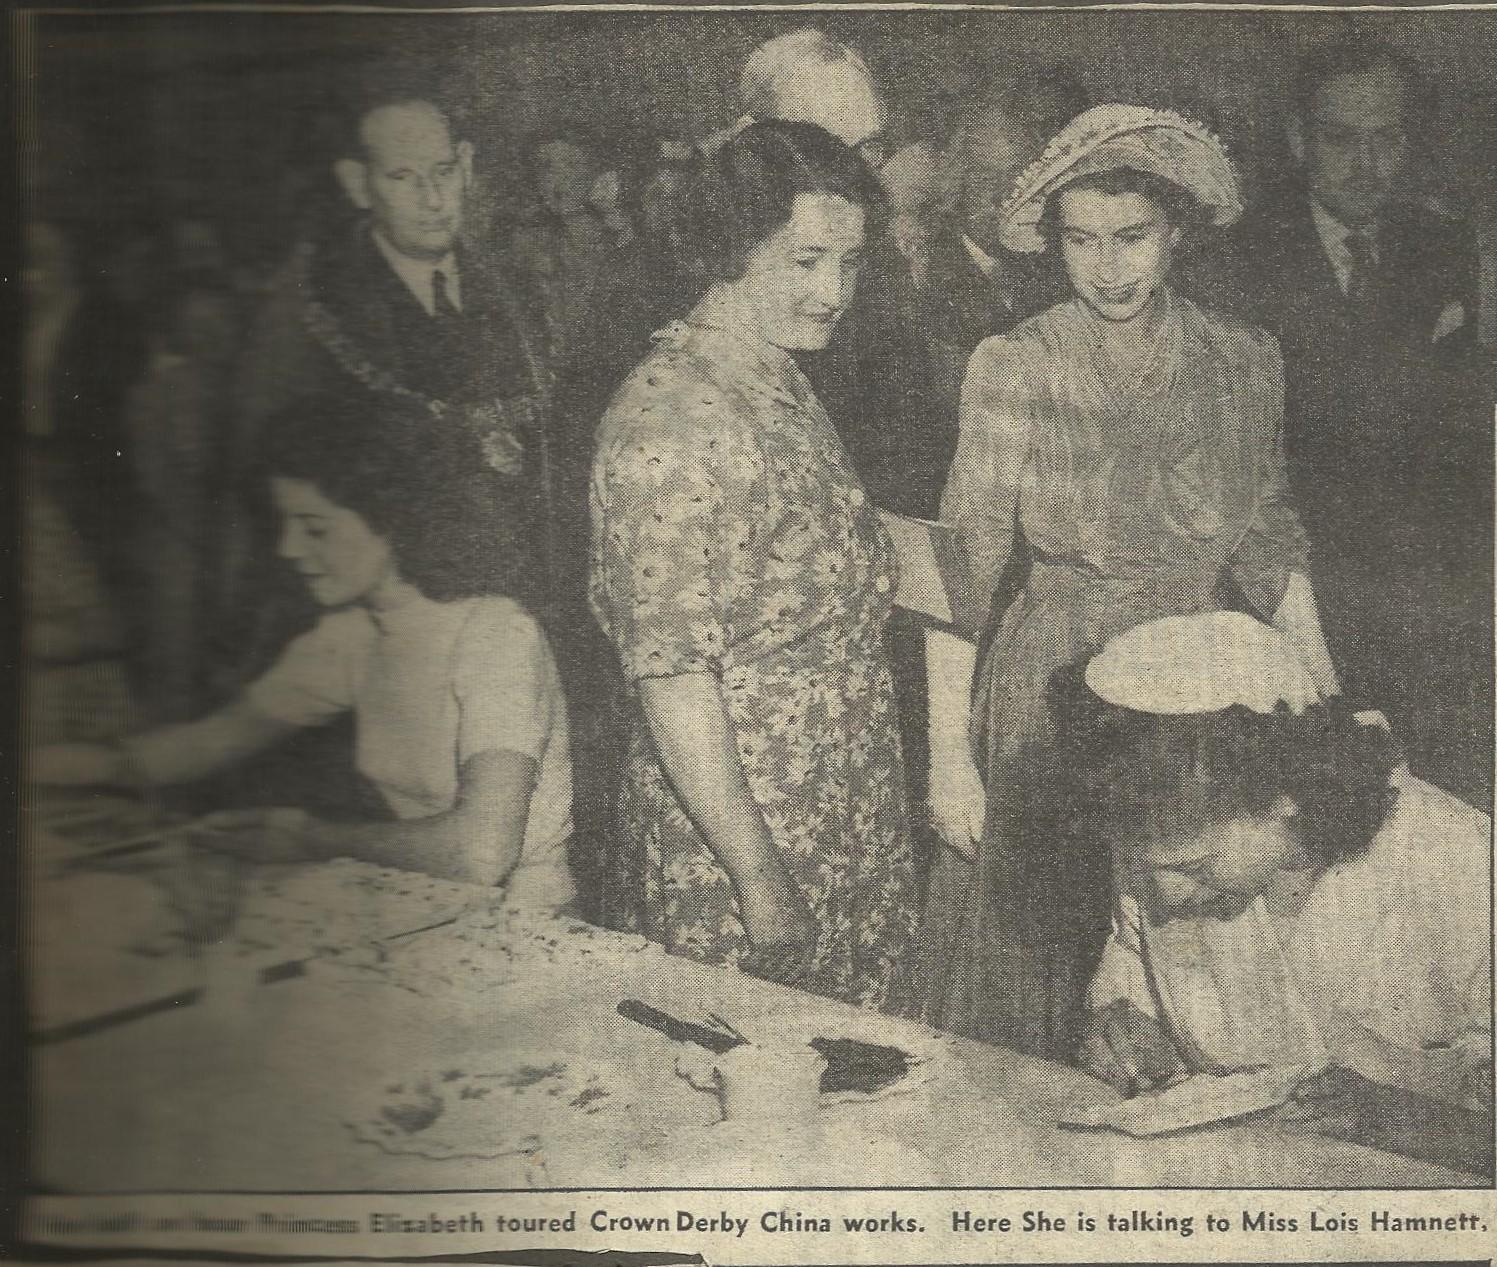 royal-crown-derby-factory-tour-princess-elizabeth-1949-miss-lois-hamnett